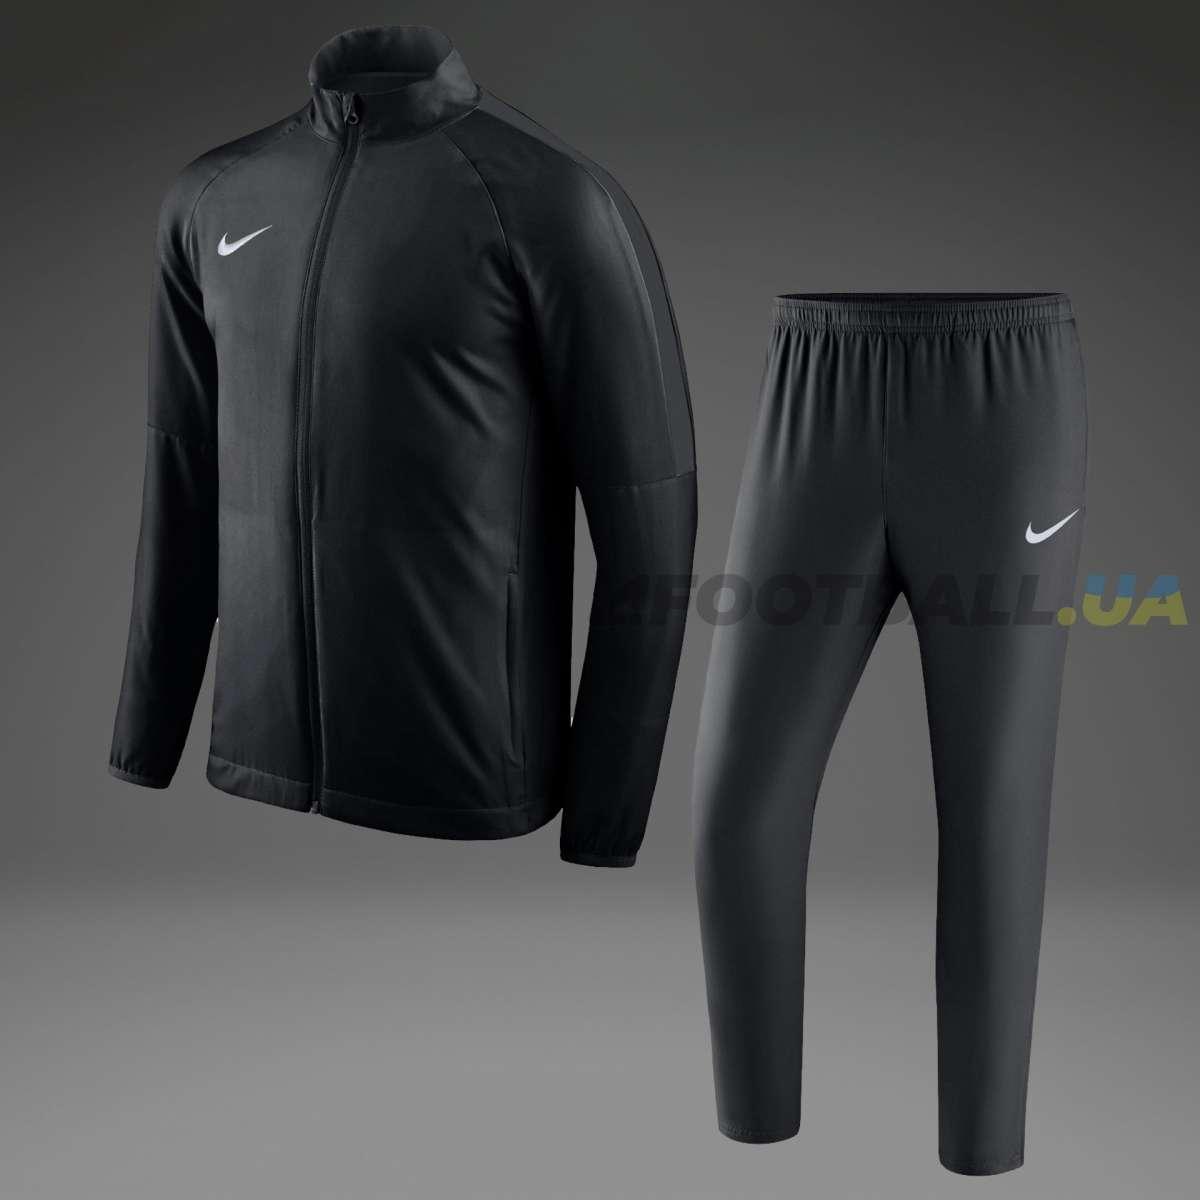 04085c24 Спортивный костюм NIKE DRY ACDMY18 TRK SUIT 893709-010 купить на ...